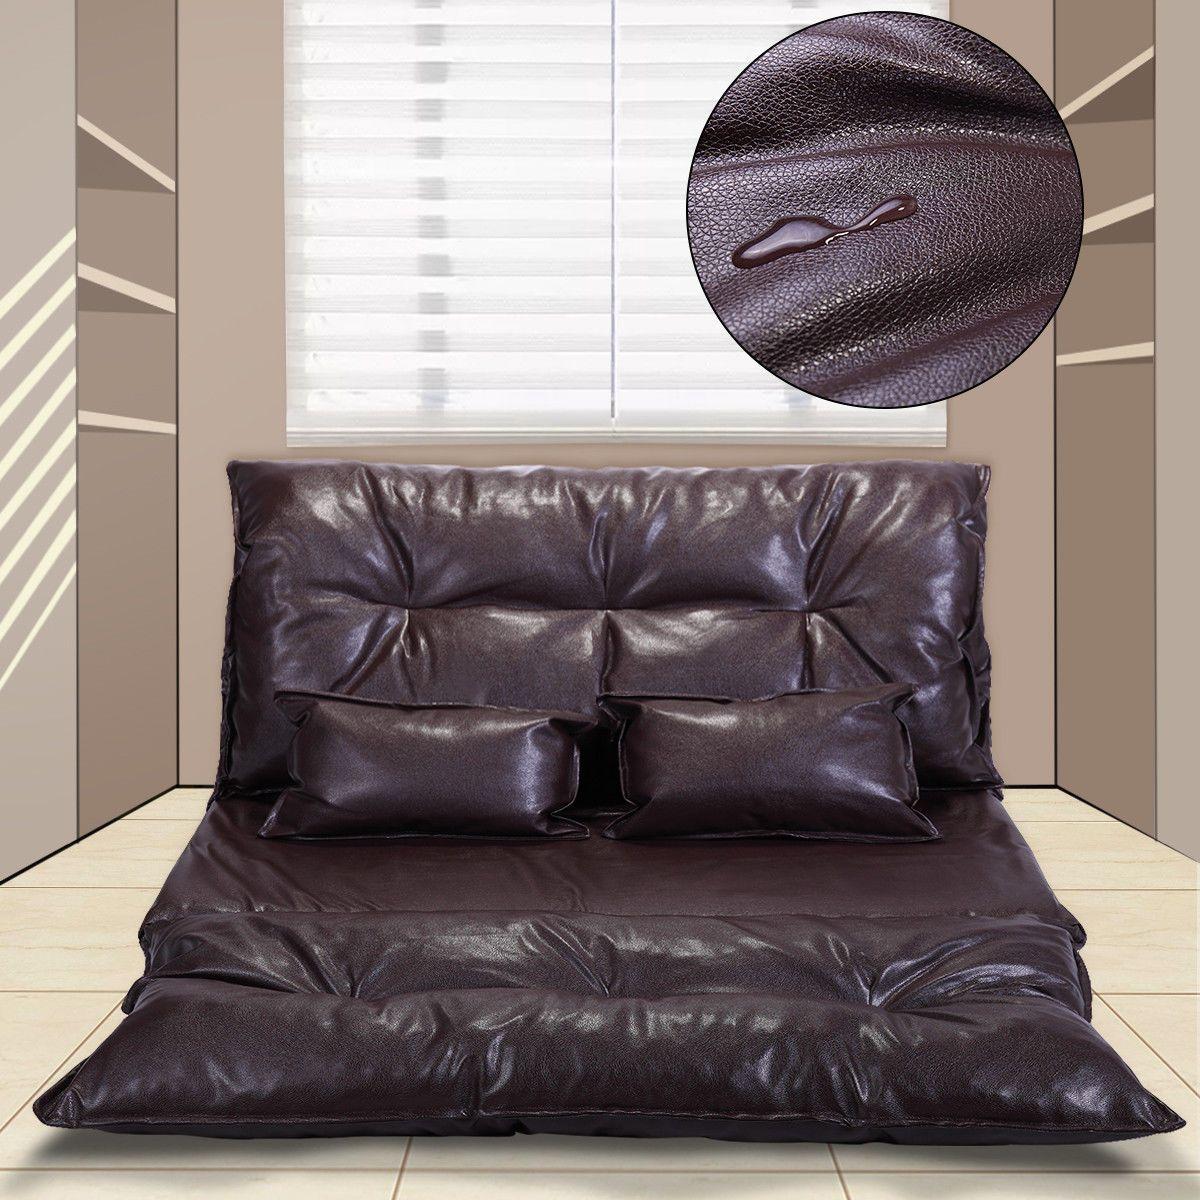 Gaming Sofa | 88 49 Home Theater Seats Loveseat Sofa Seating Foldable Pu Leather